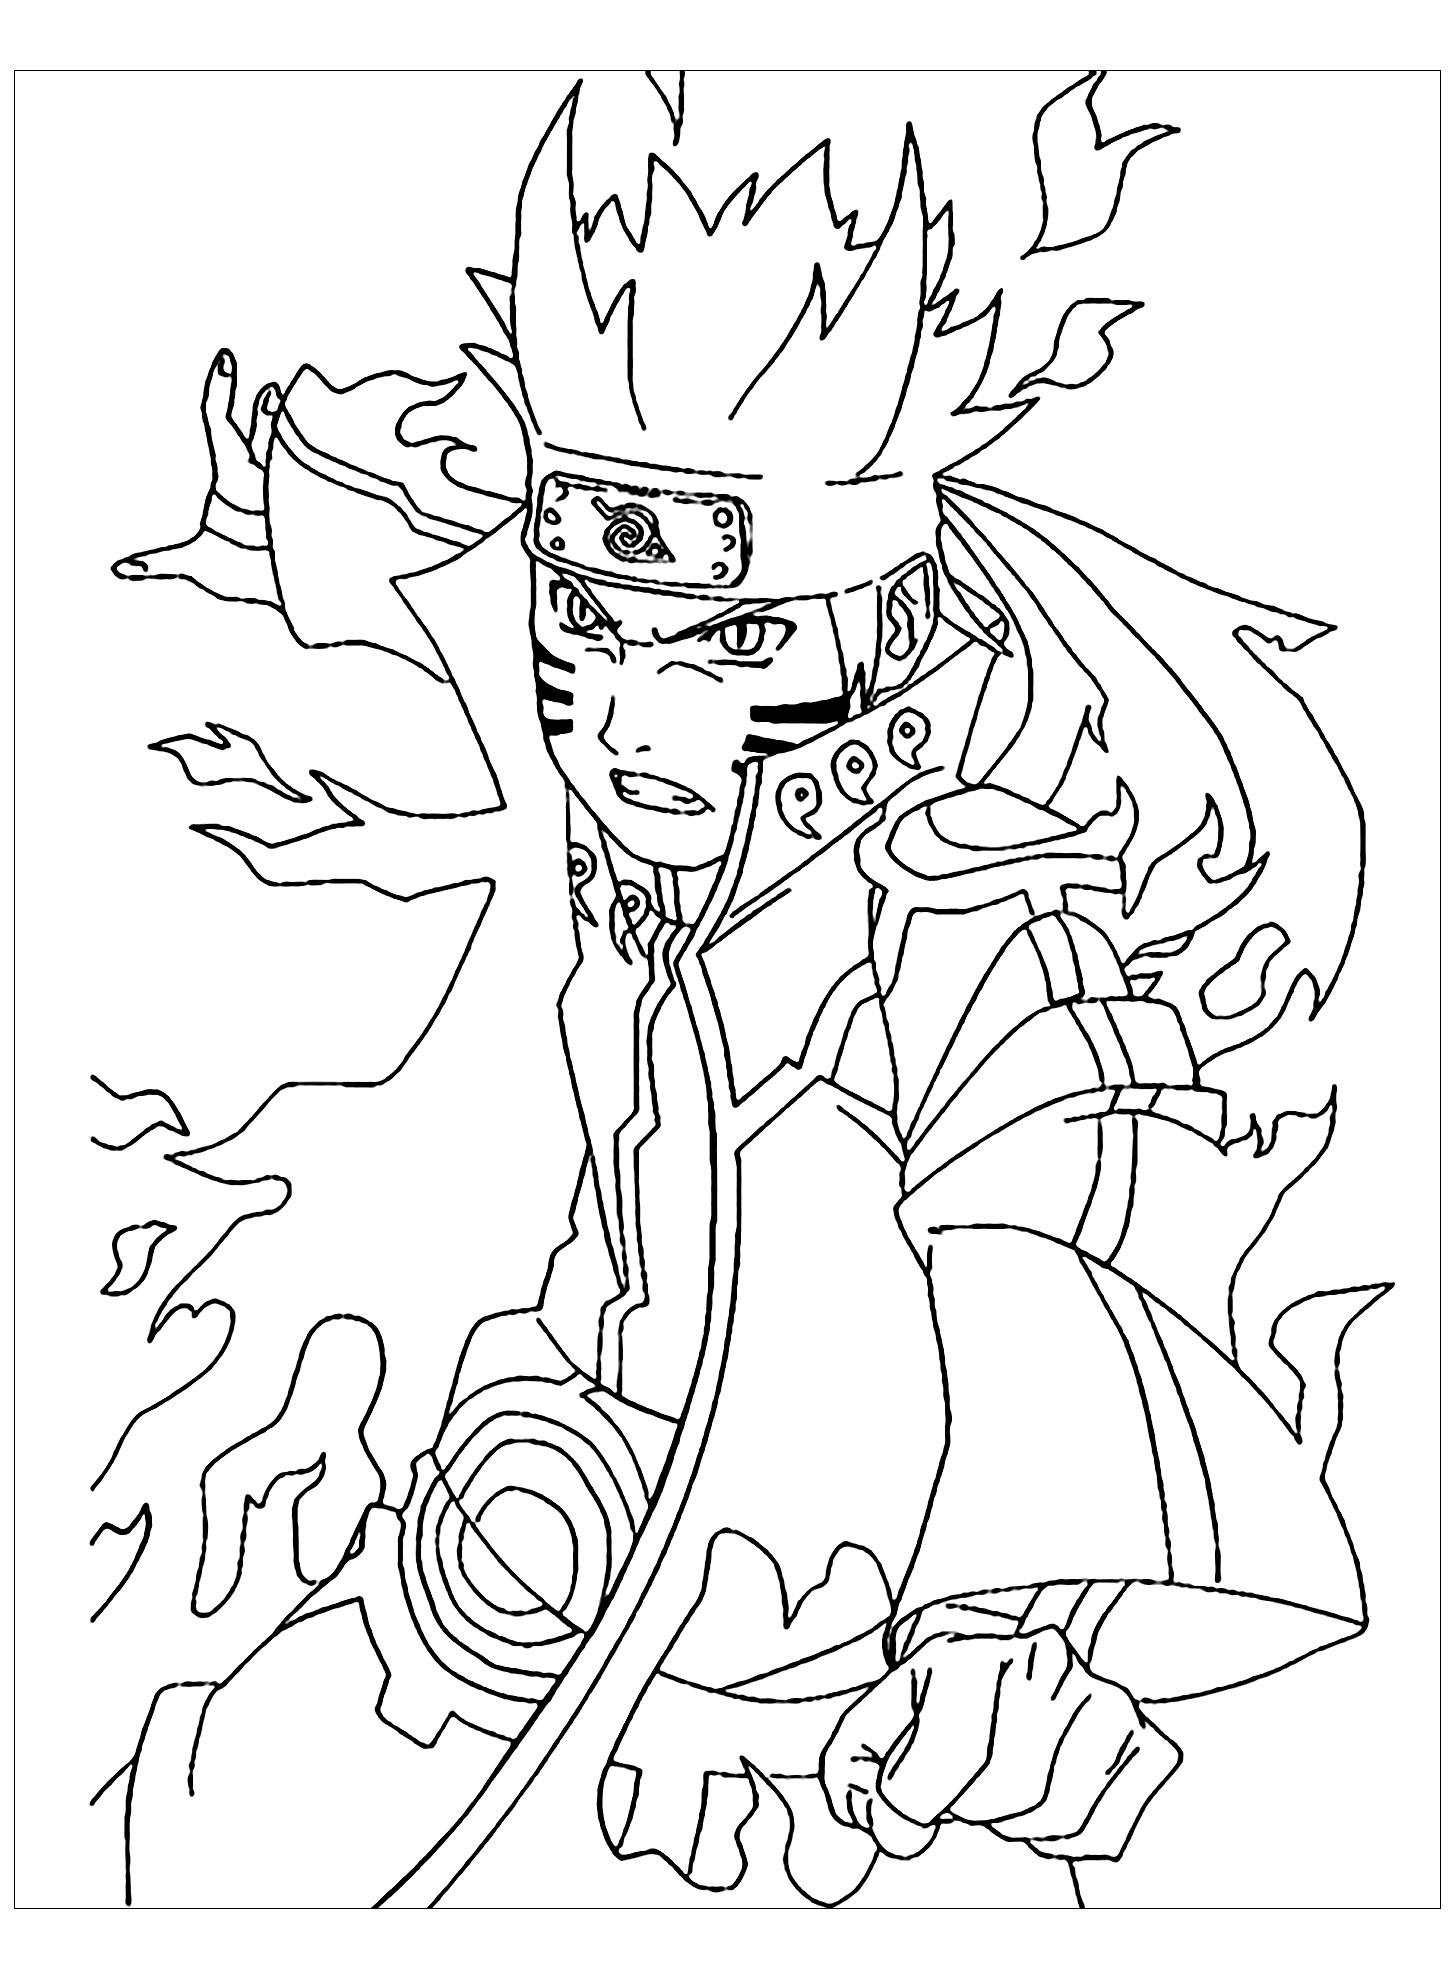 naruto coloring page naruto coloring pages sasuke bestappsforkidscom coloring naruto page